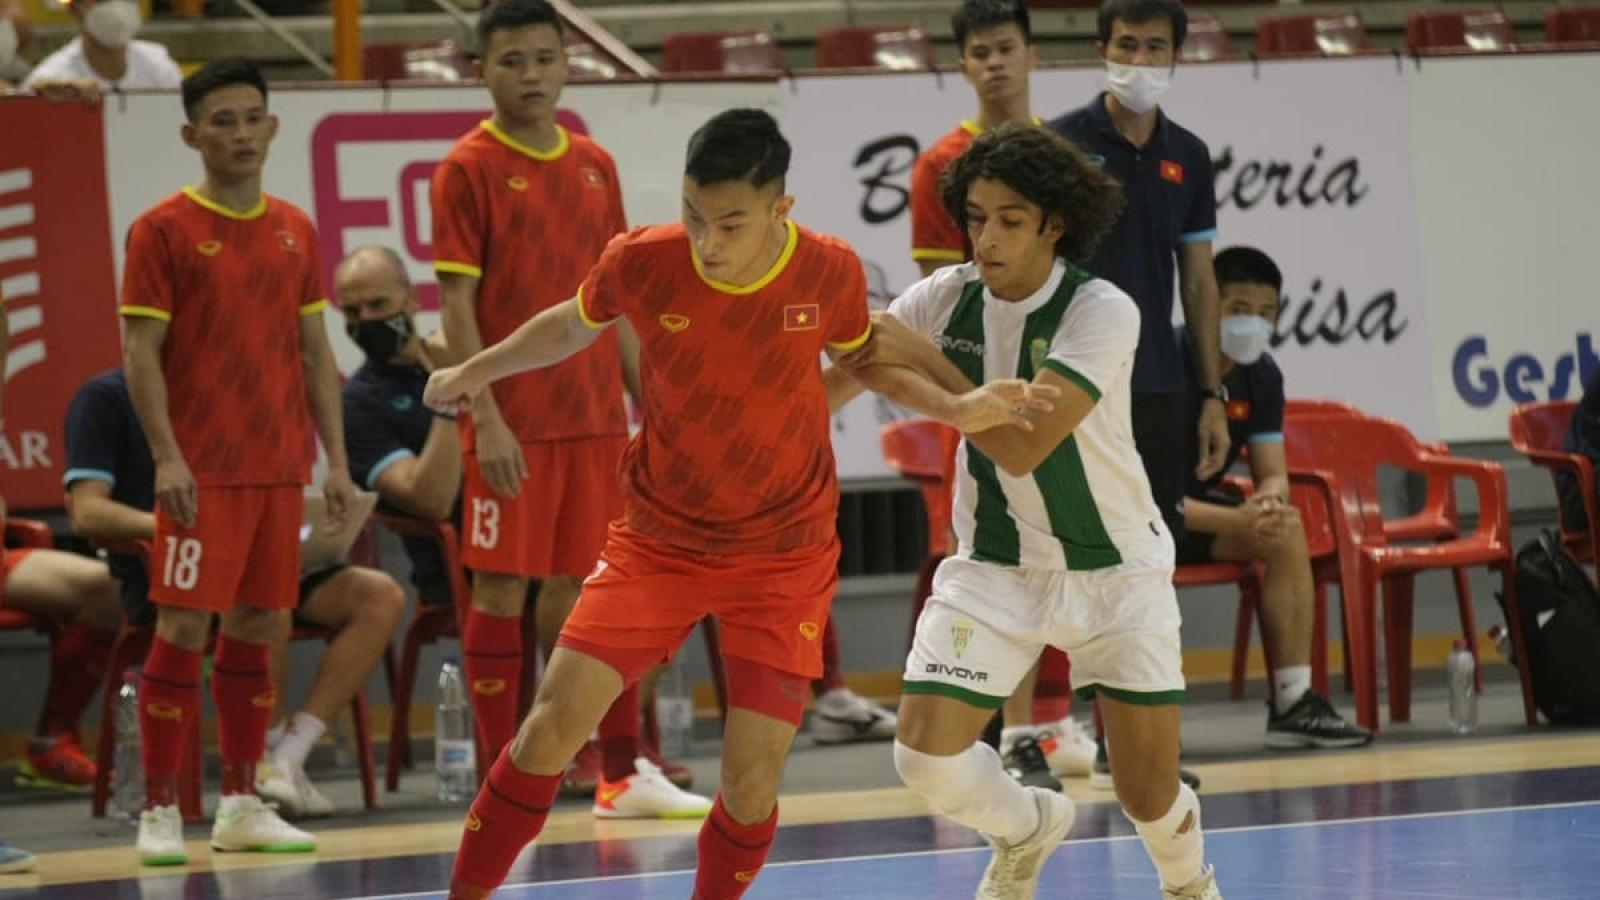 Vietnam draw against leading Spanish team in futsal tournament